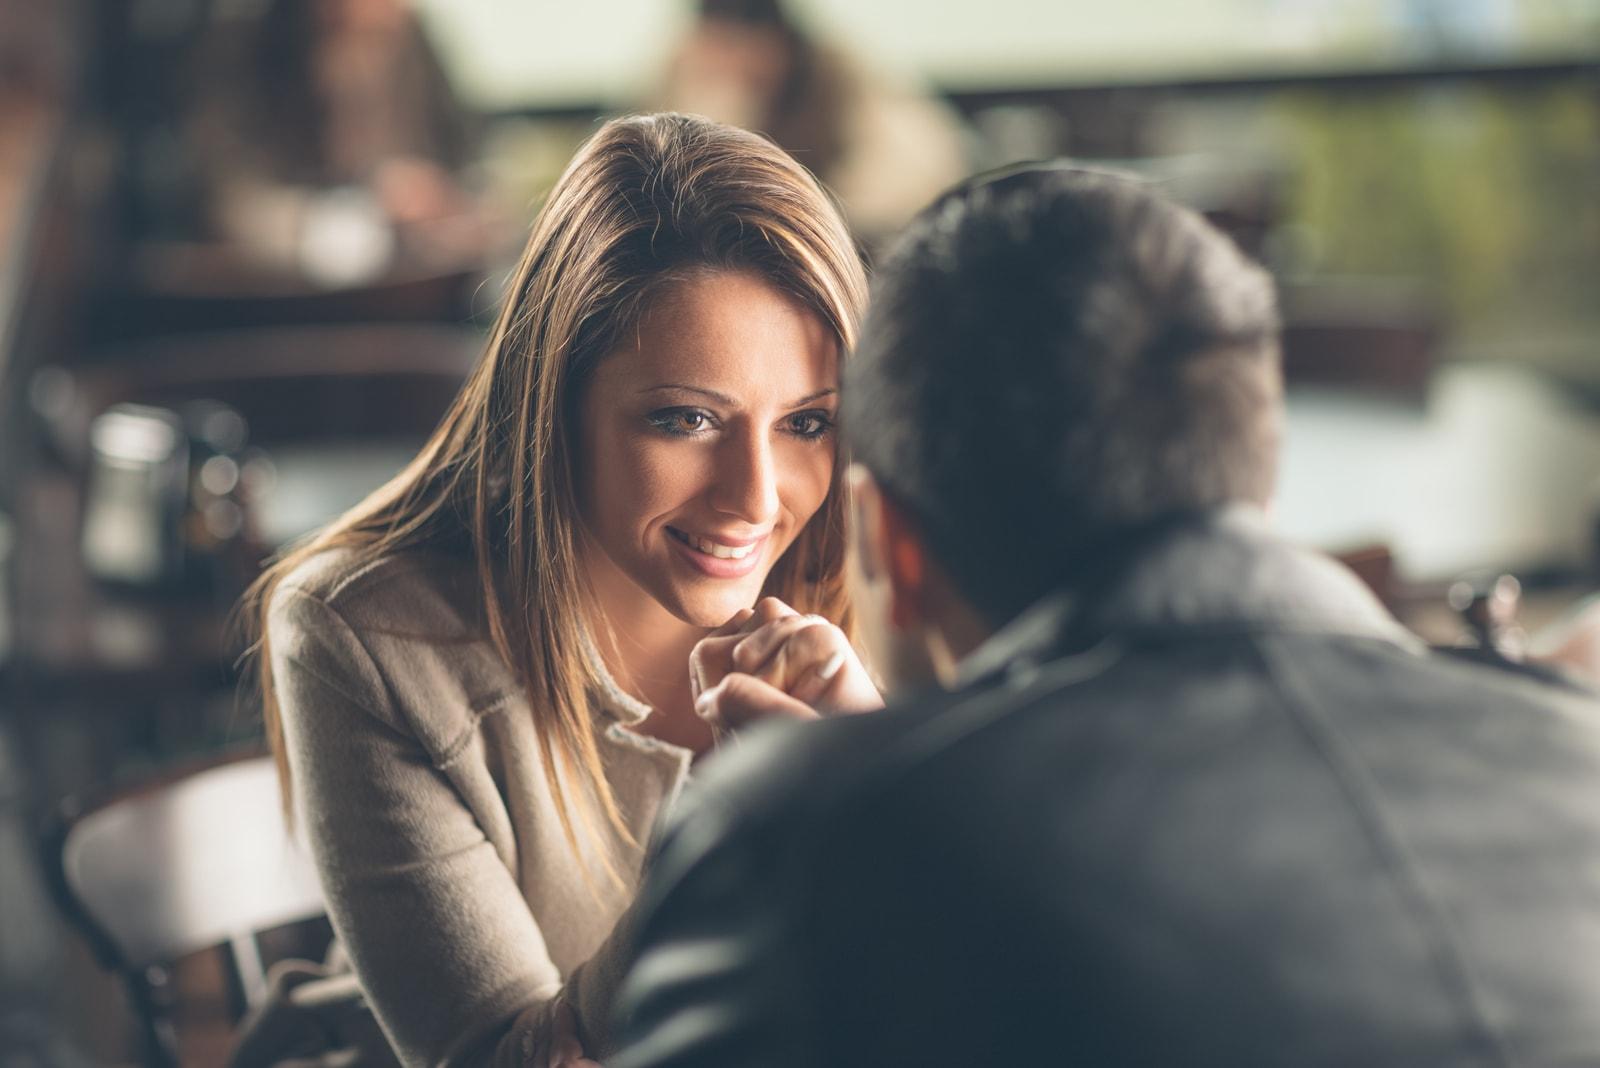 young smiling woman looking at man